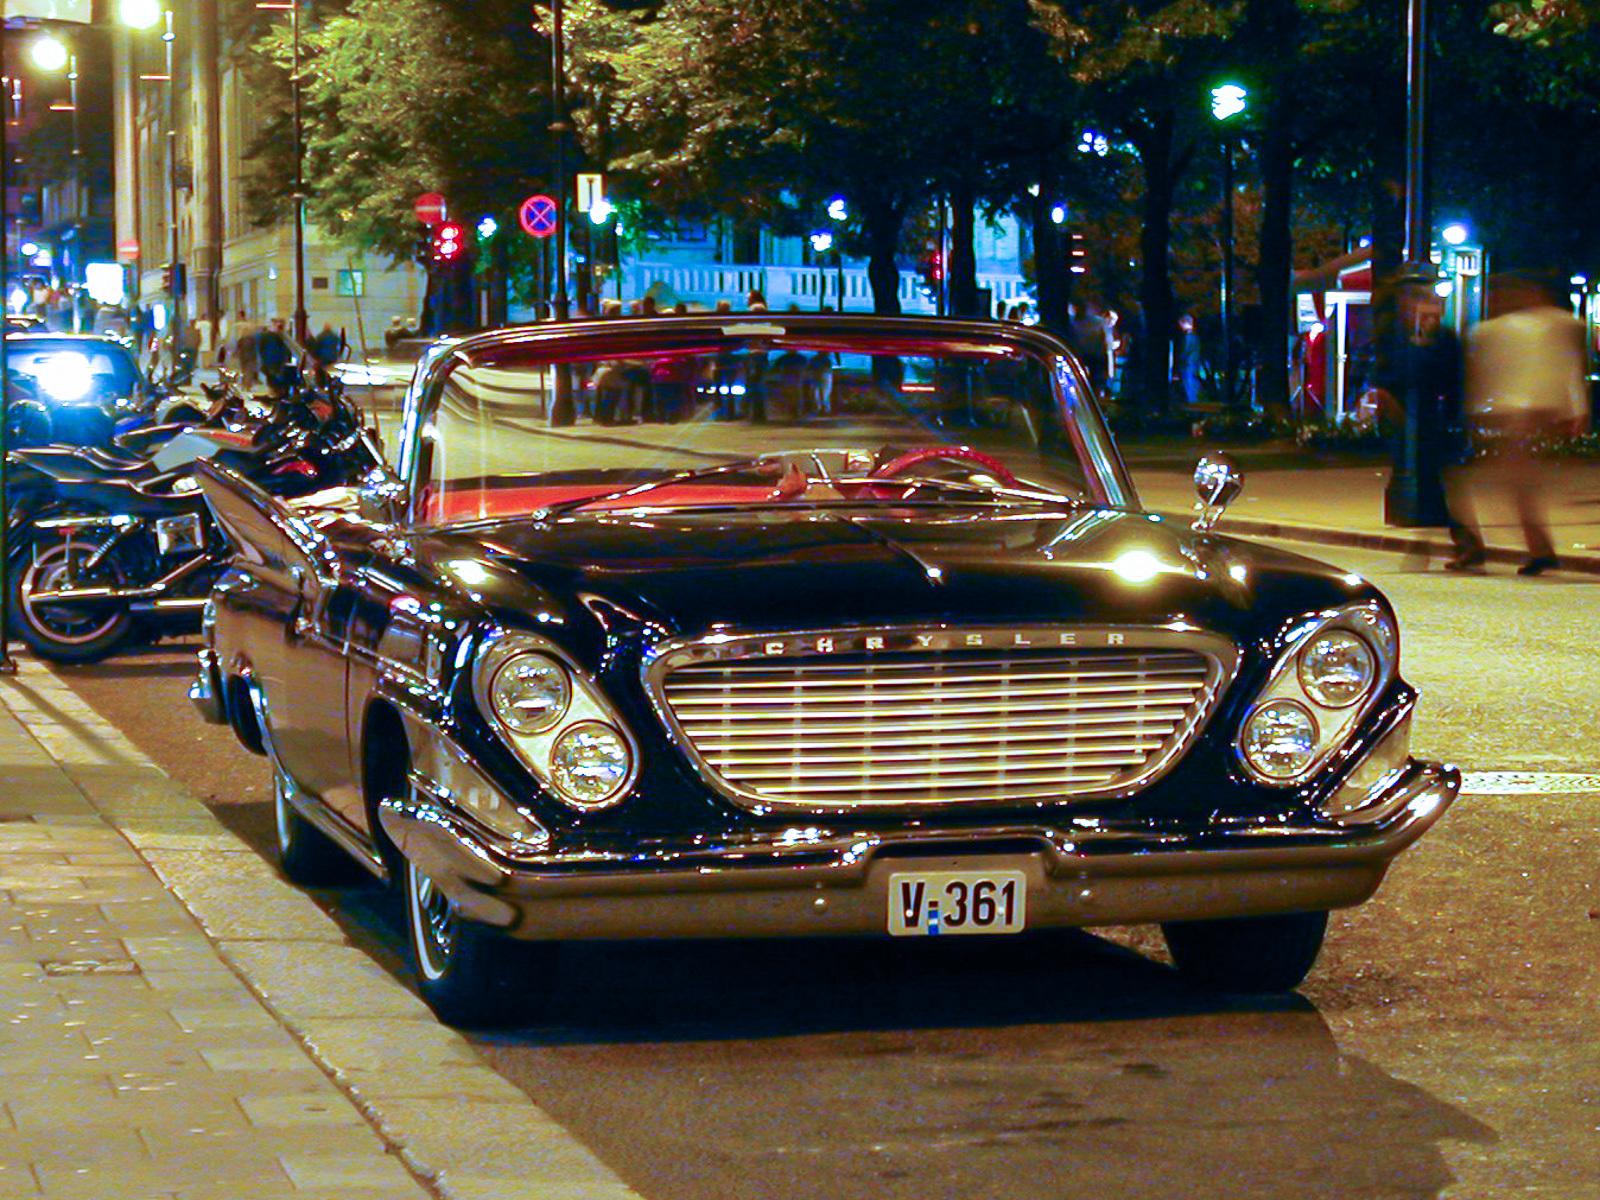 013-1961 Chrysler Newport Convertible 07. Eier- me